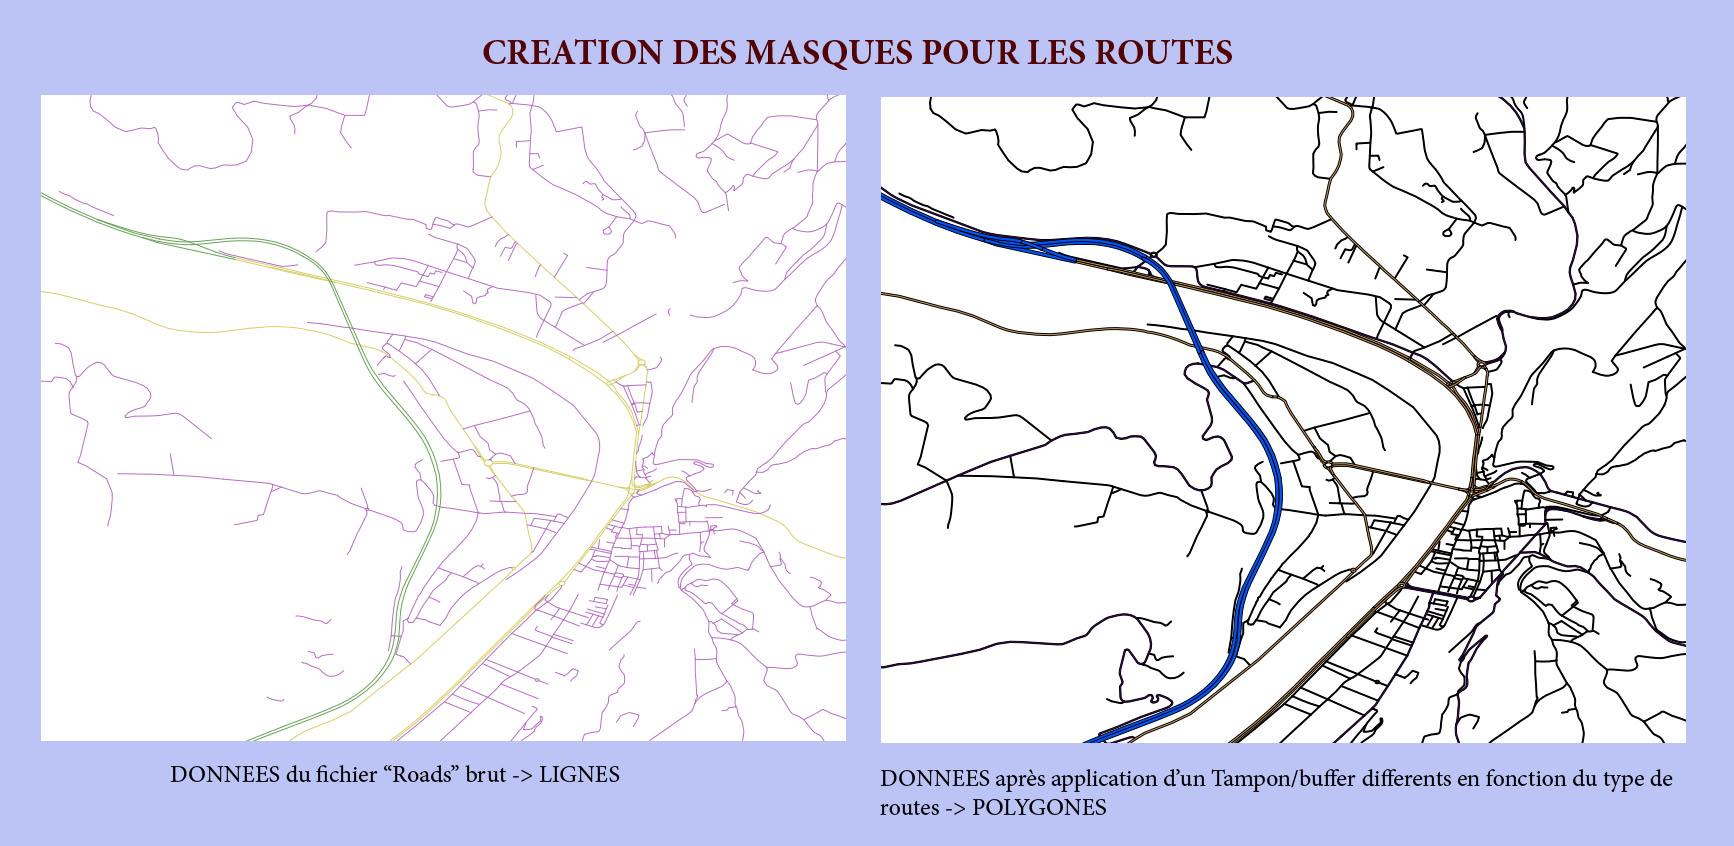 http://vogel69.free.fr/FSim/Masques_routes.jpg